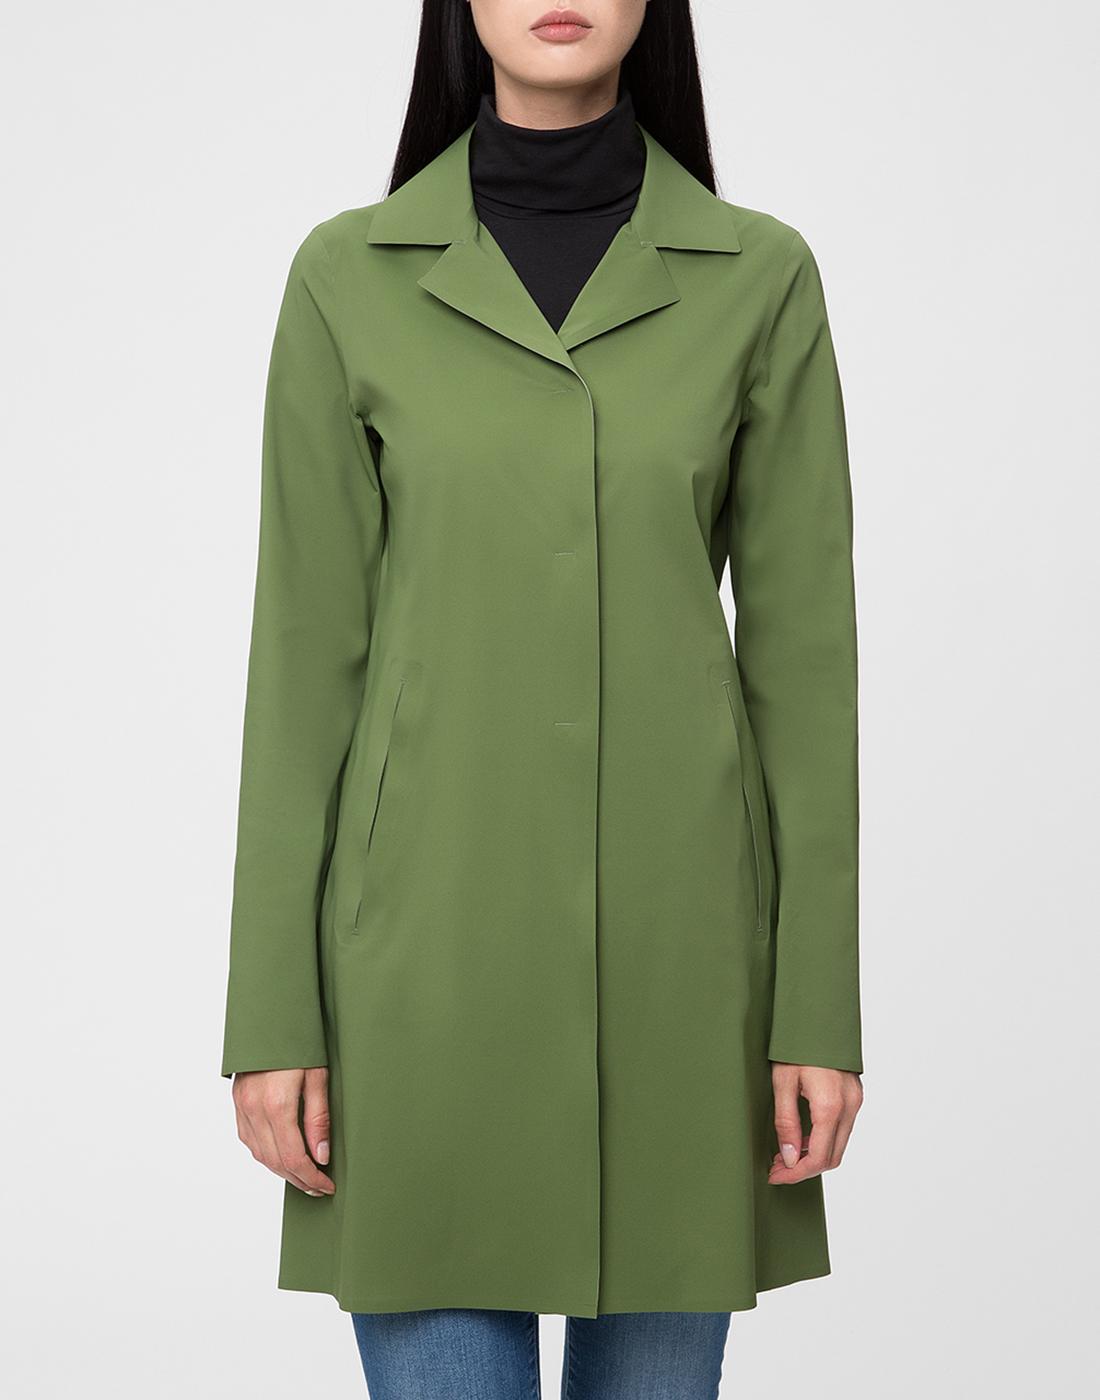 Женский зеленый плащ Herno SIM0035D-19289-7012-2